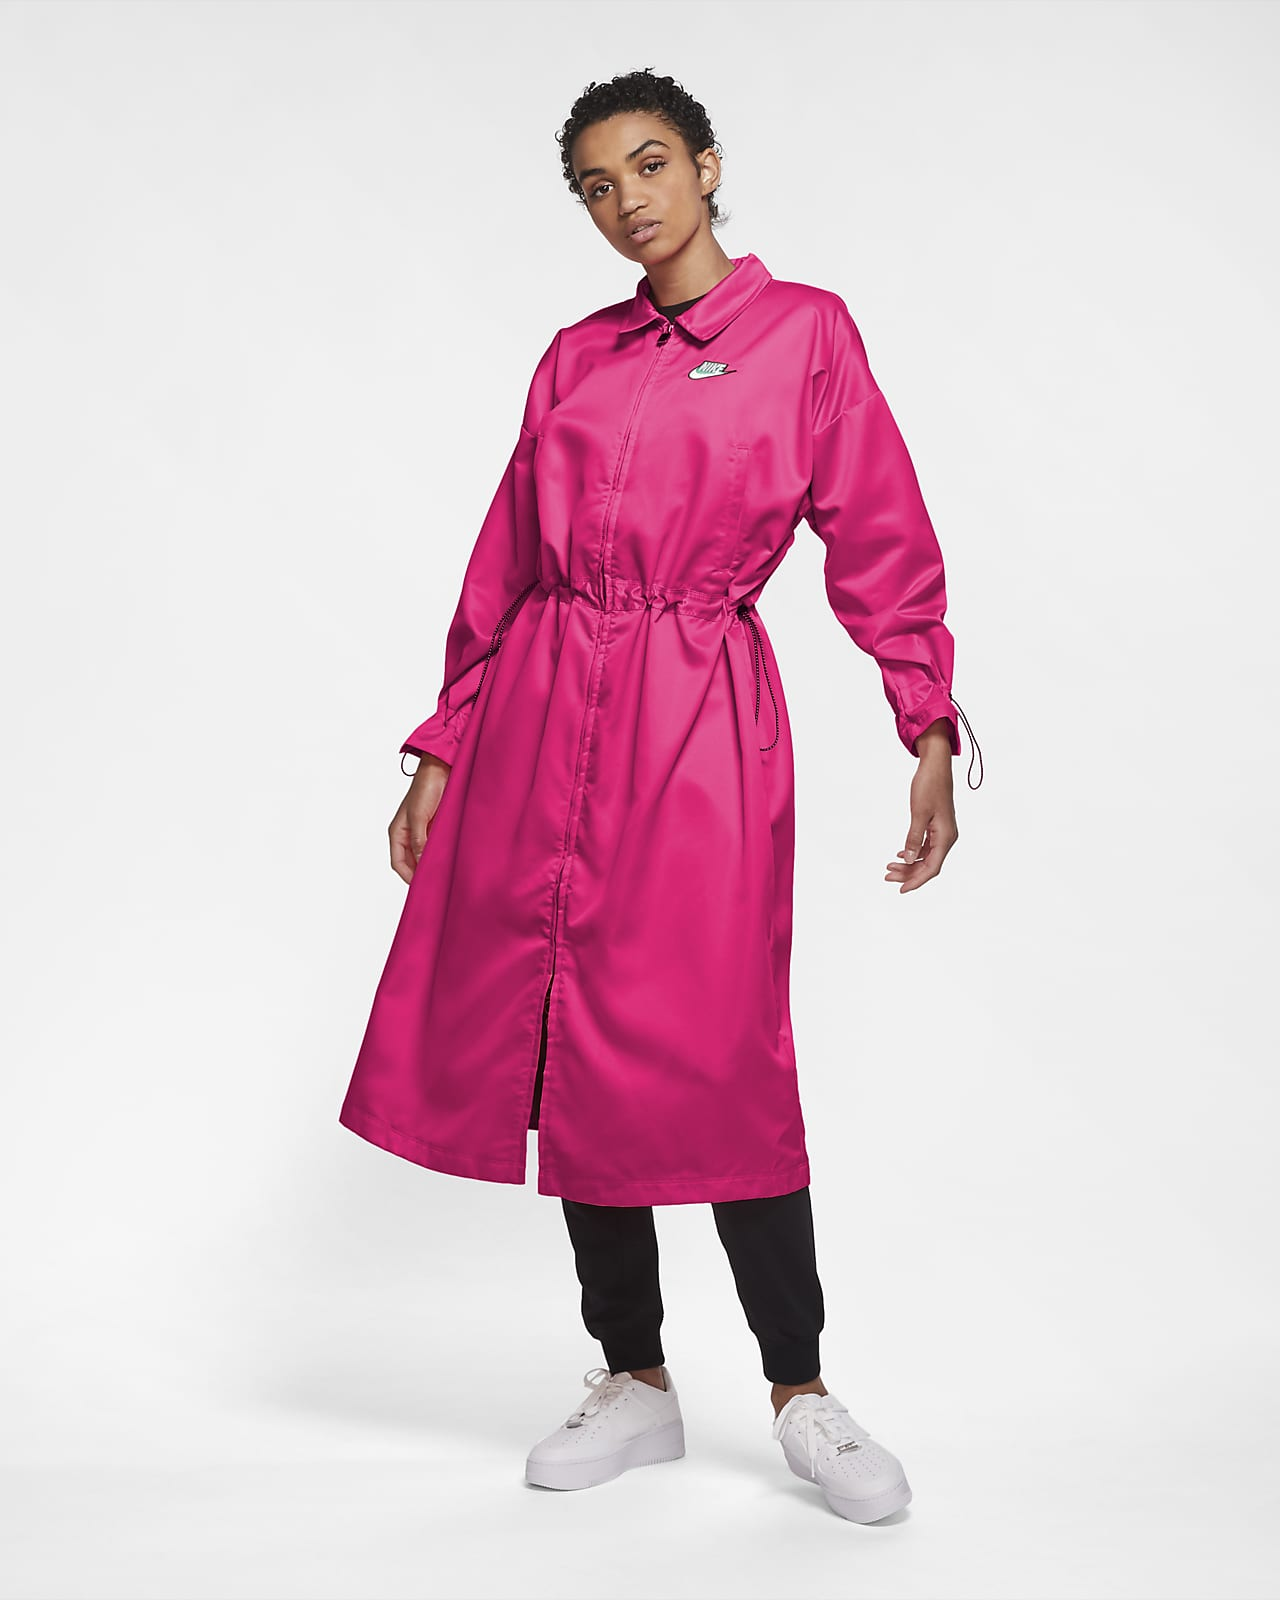 Женская удлиненная атласная куртка Nike Sportswear Icon Clash